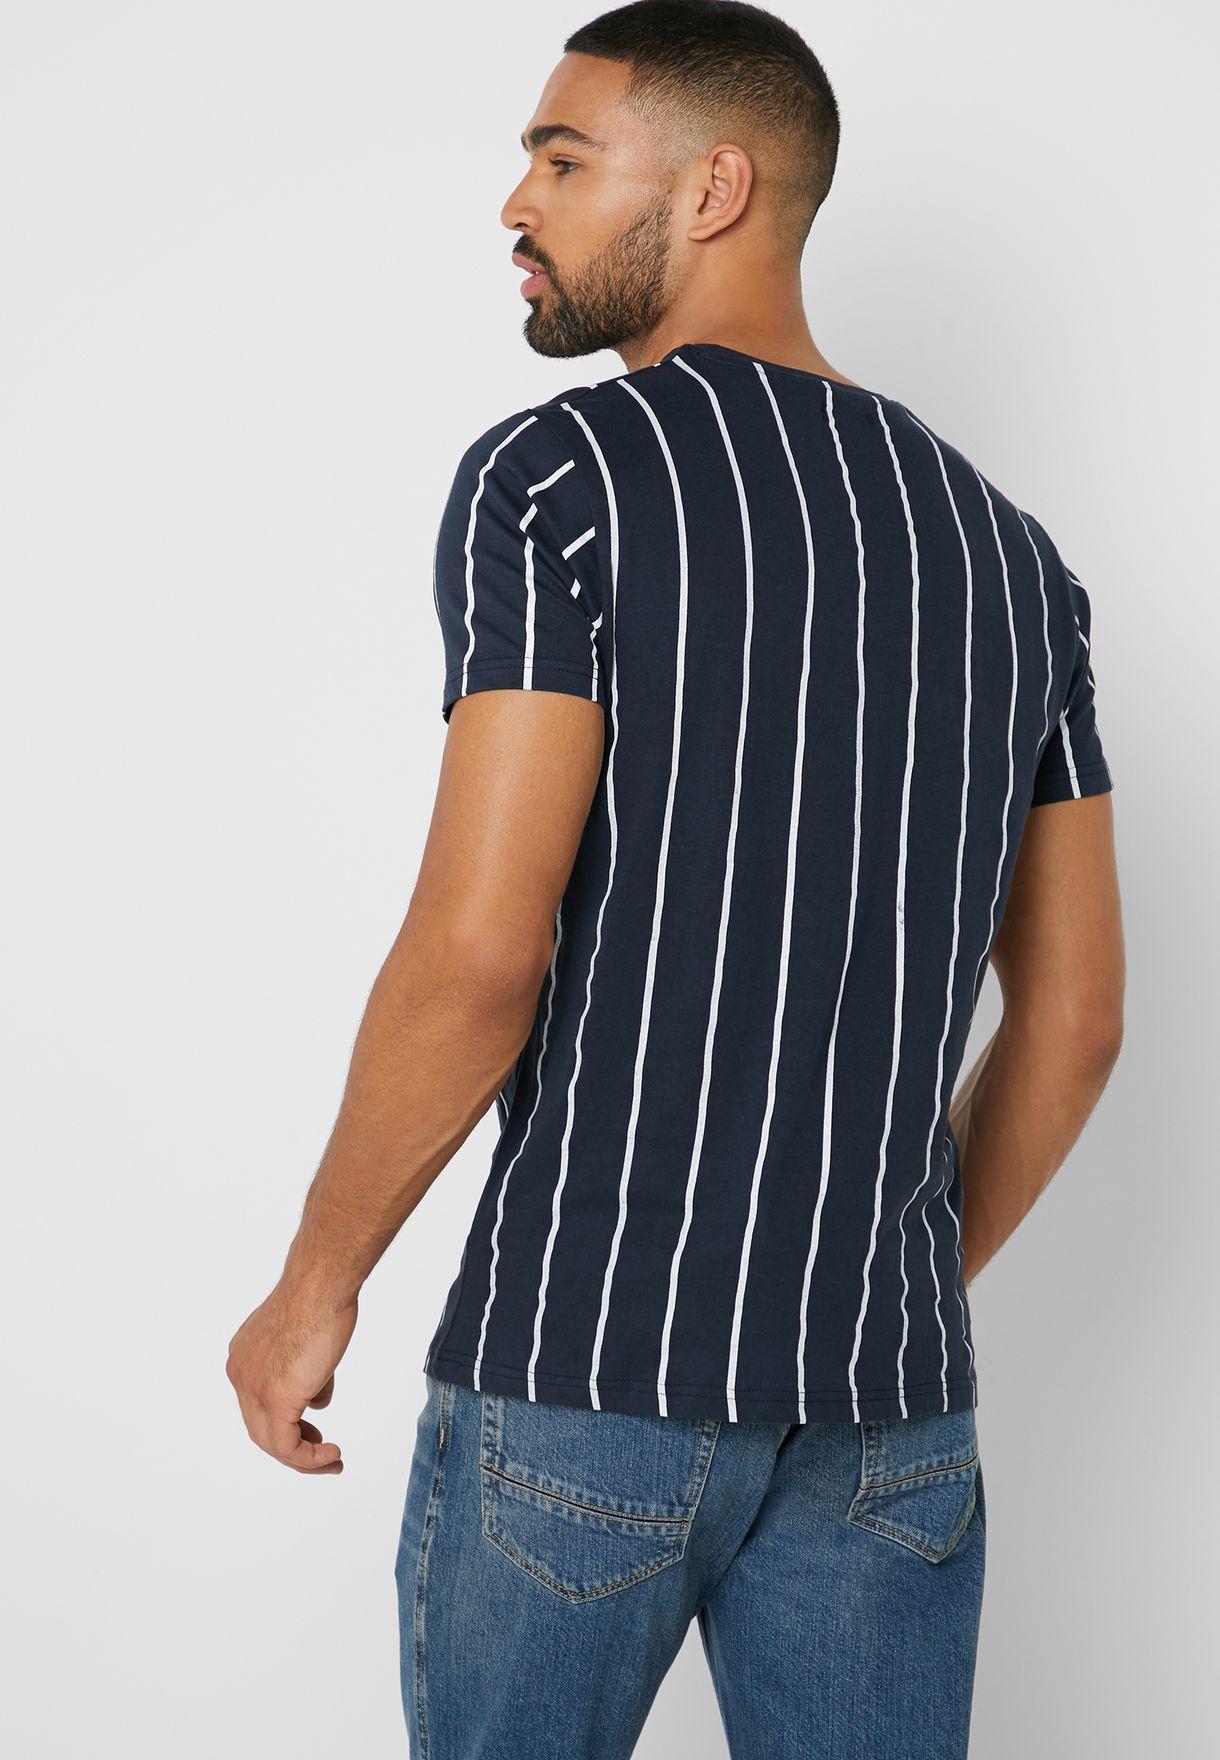 Hustlin T Shirt